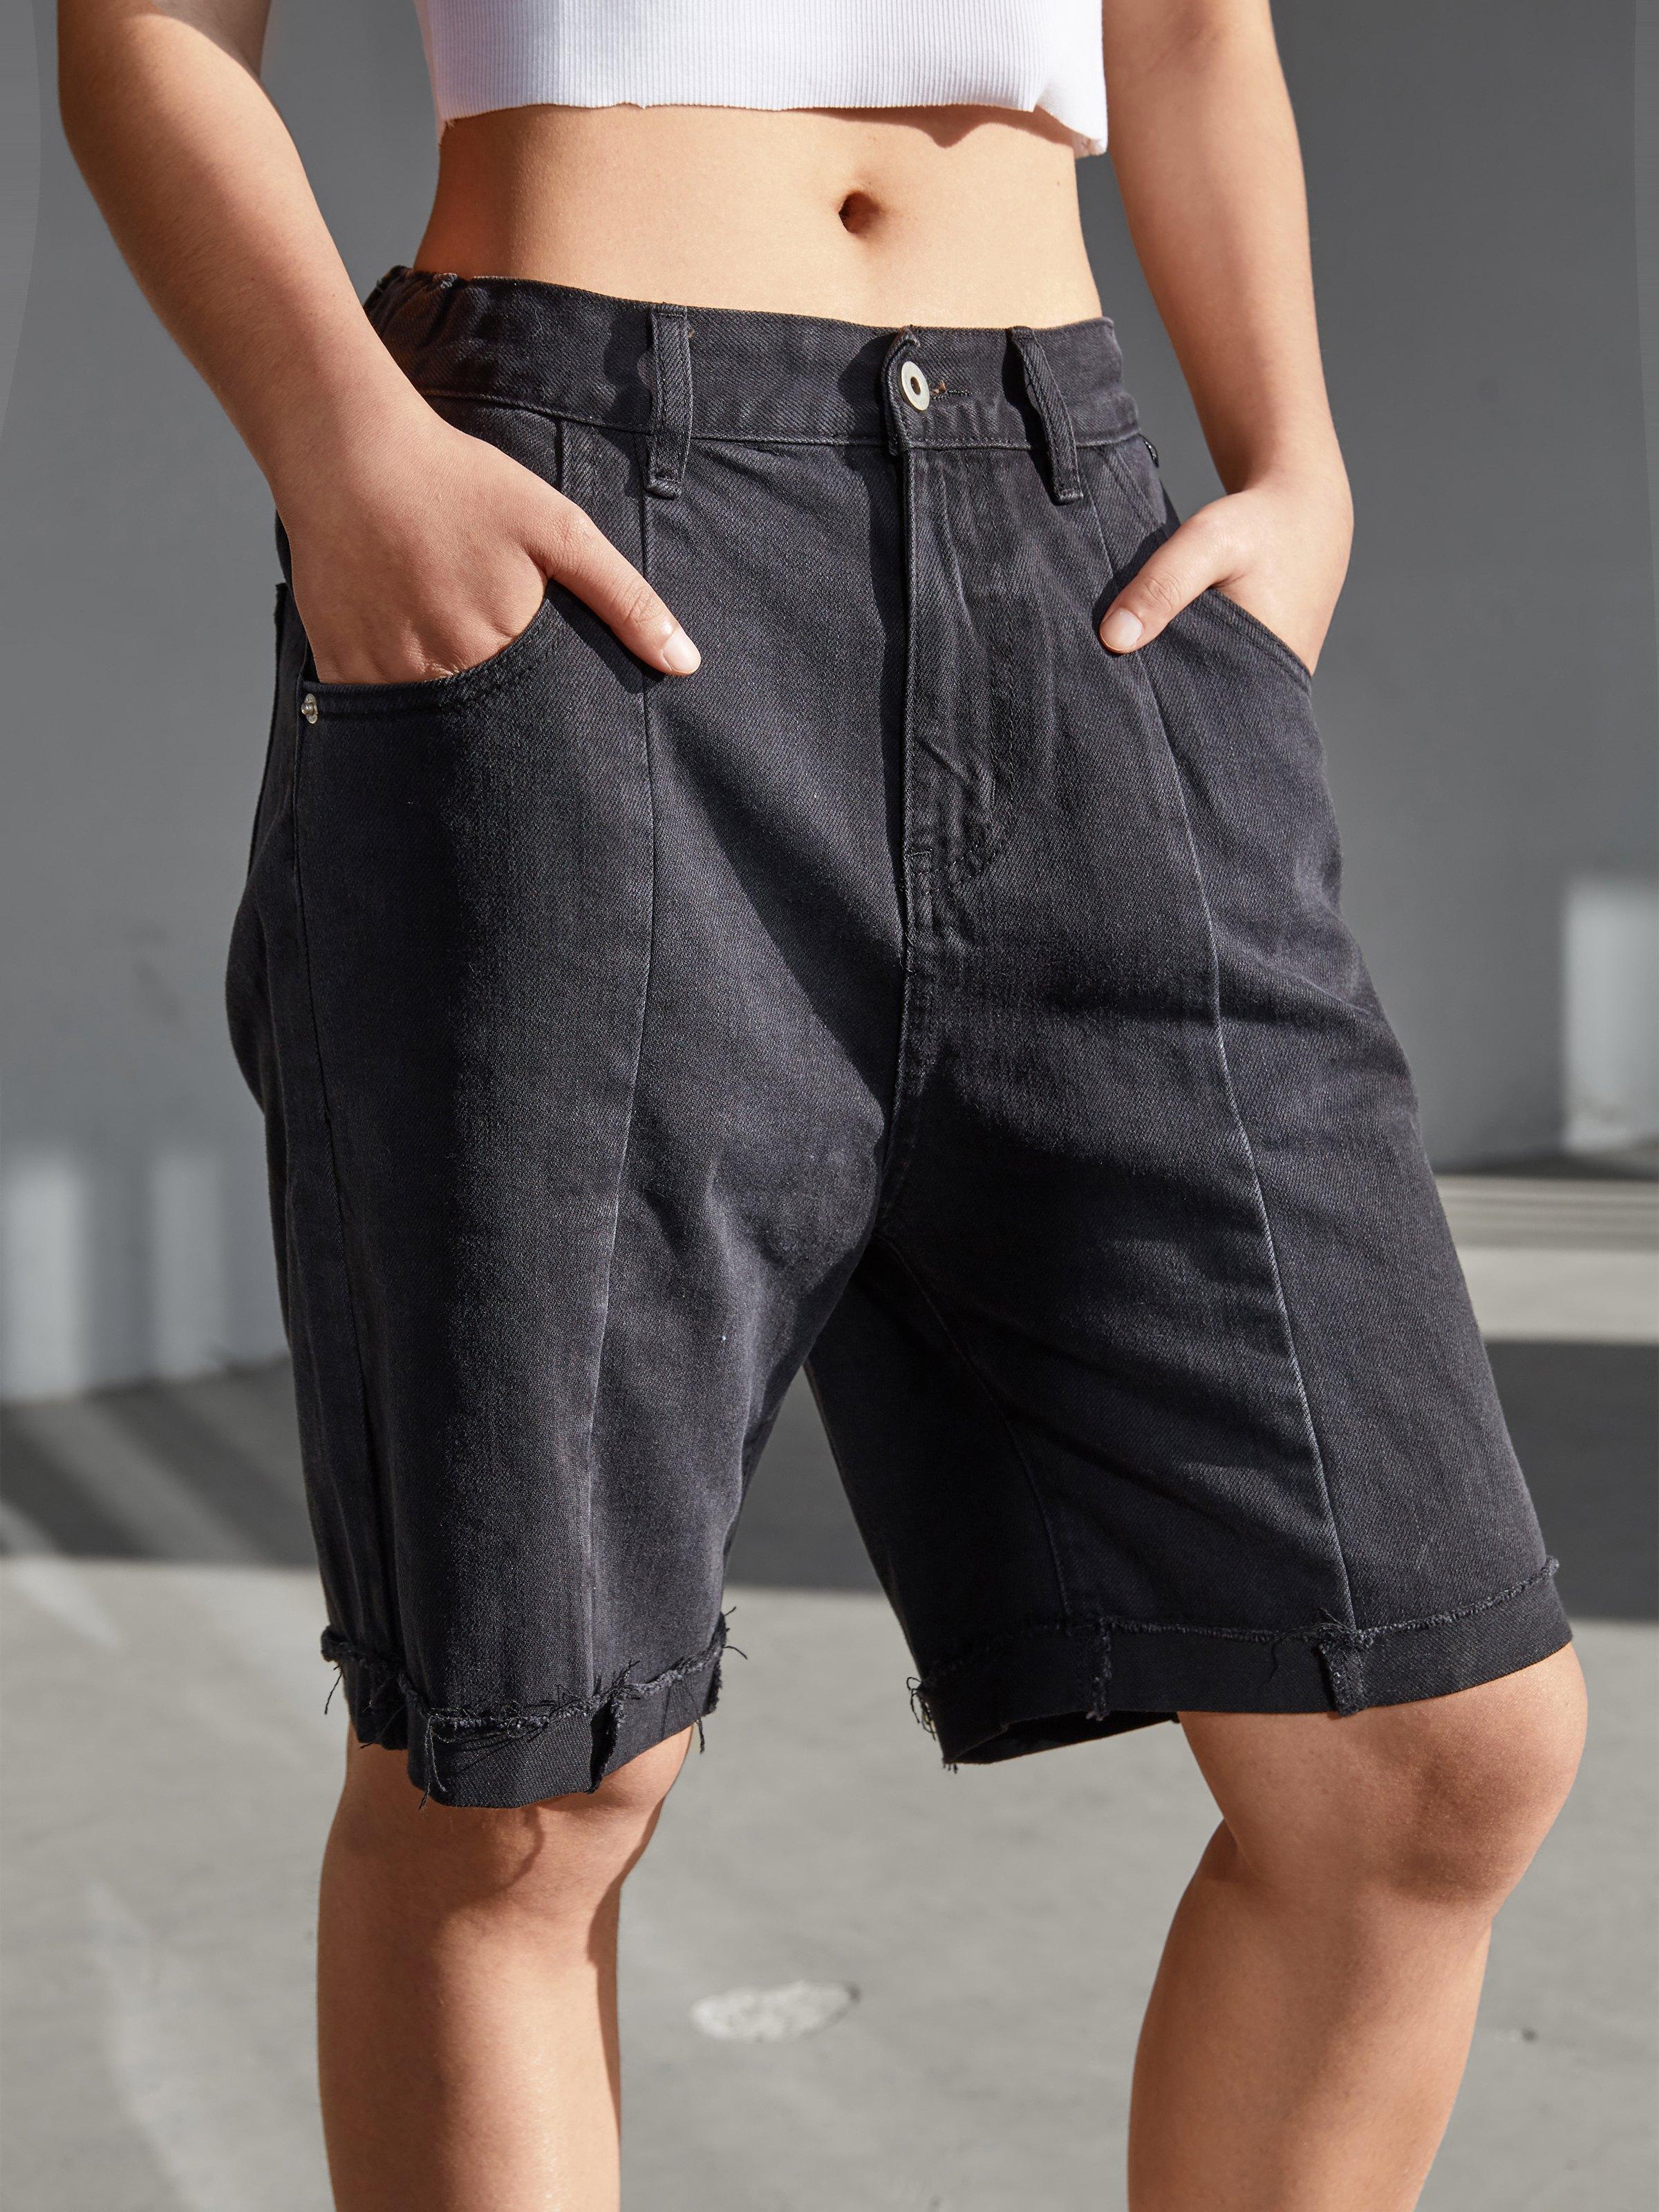 Splice High Waist Denim Shorts - Black M